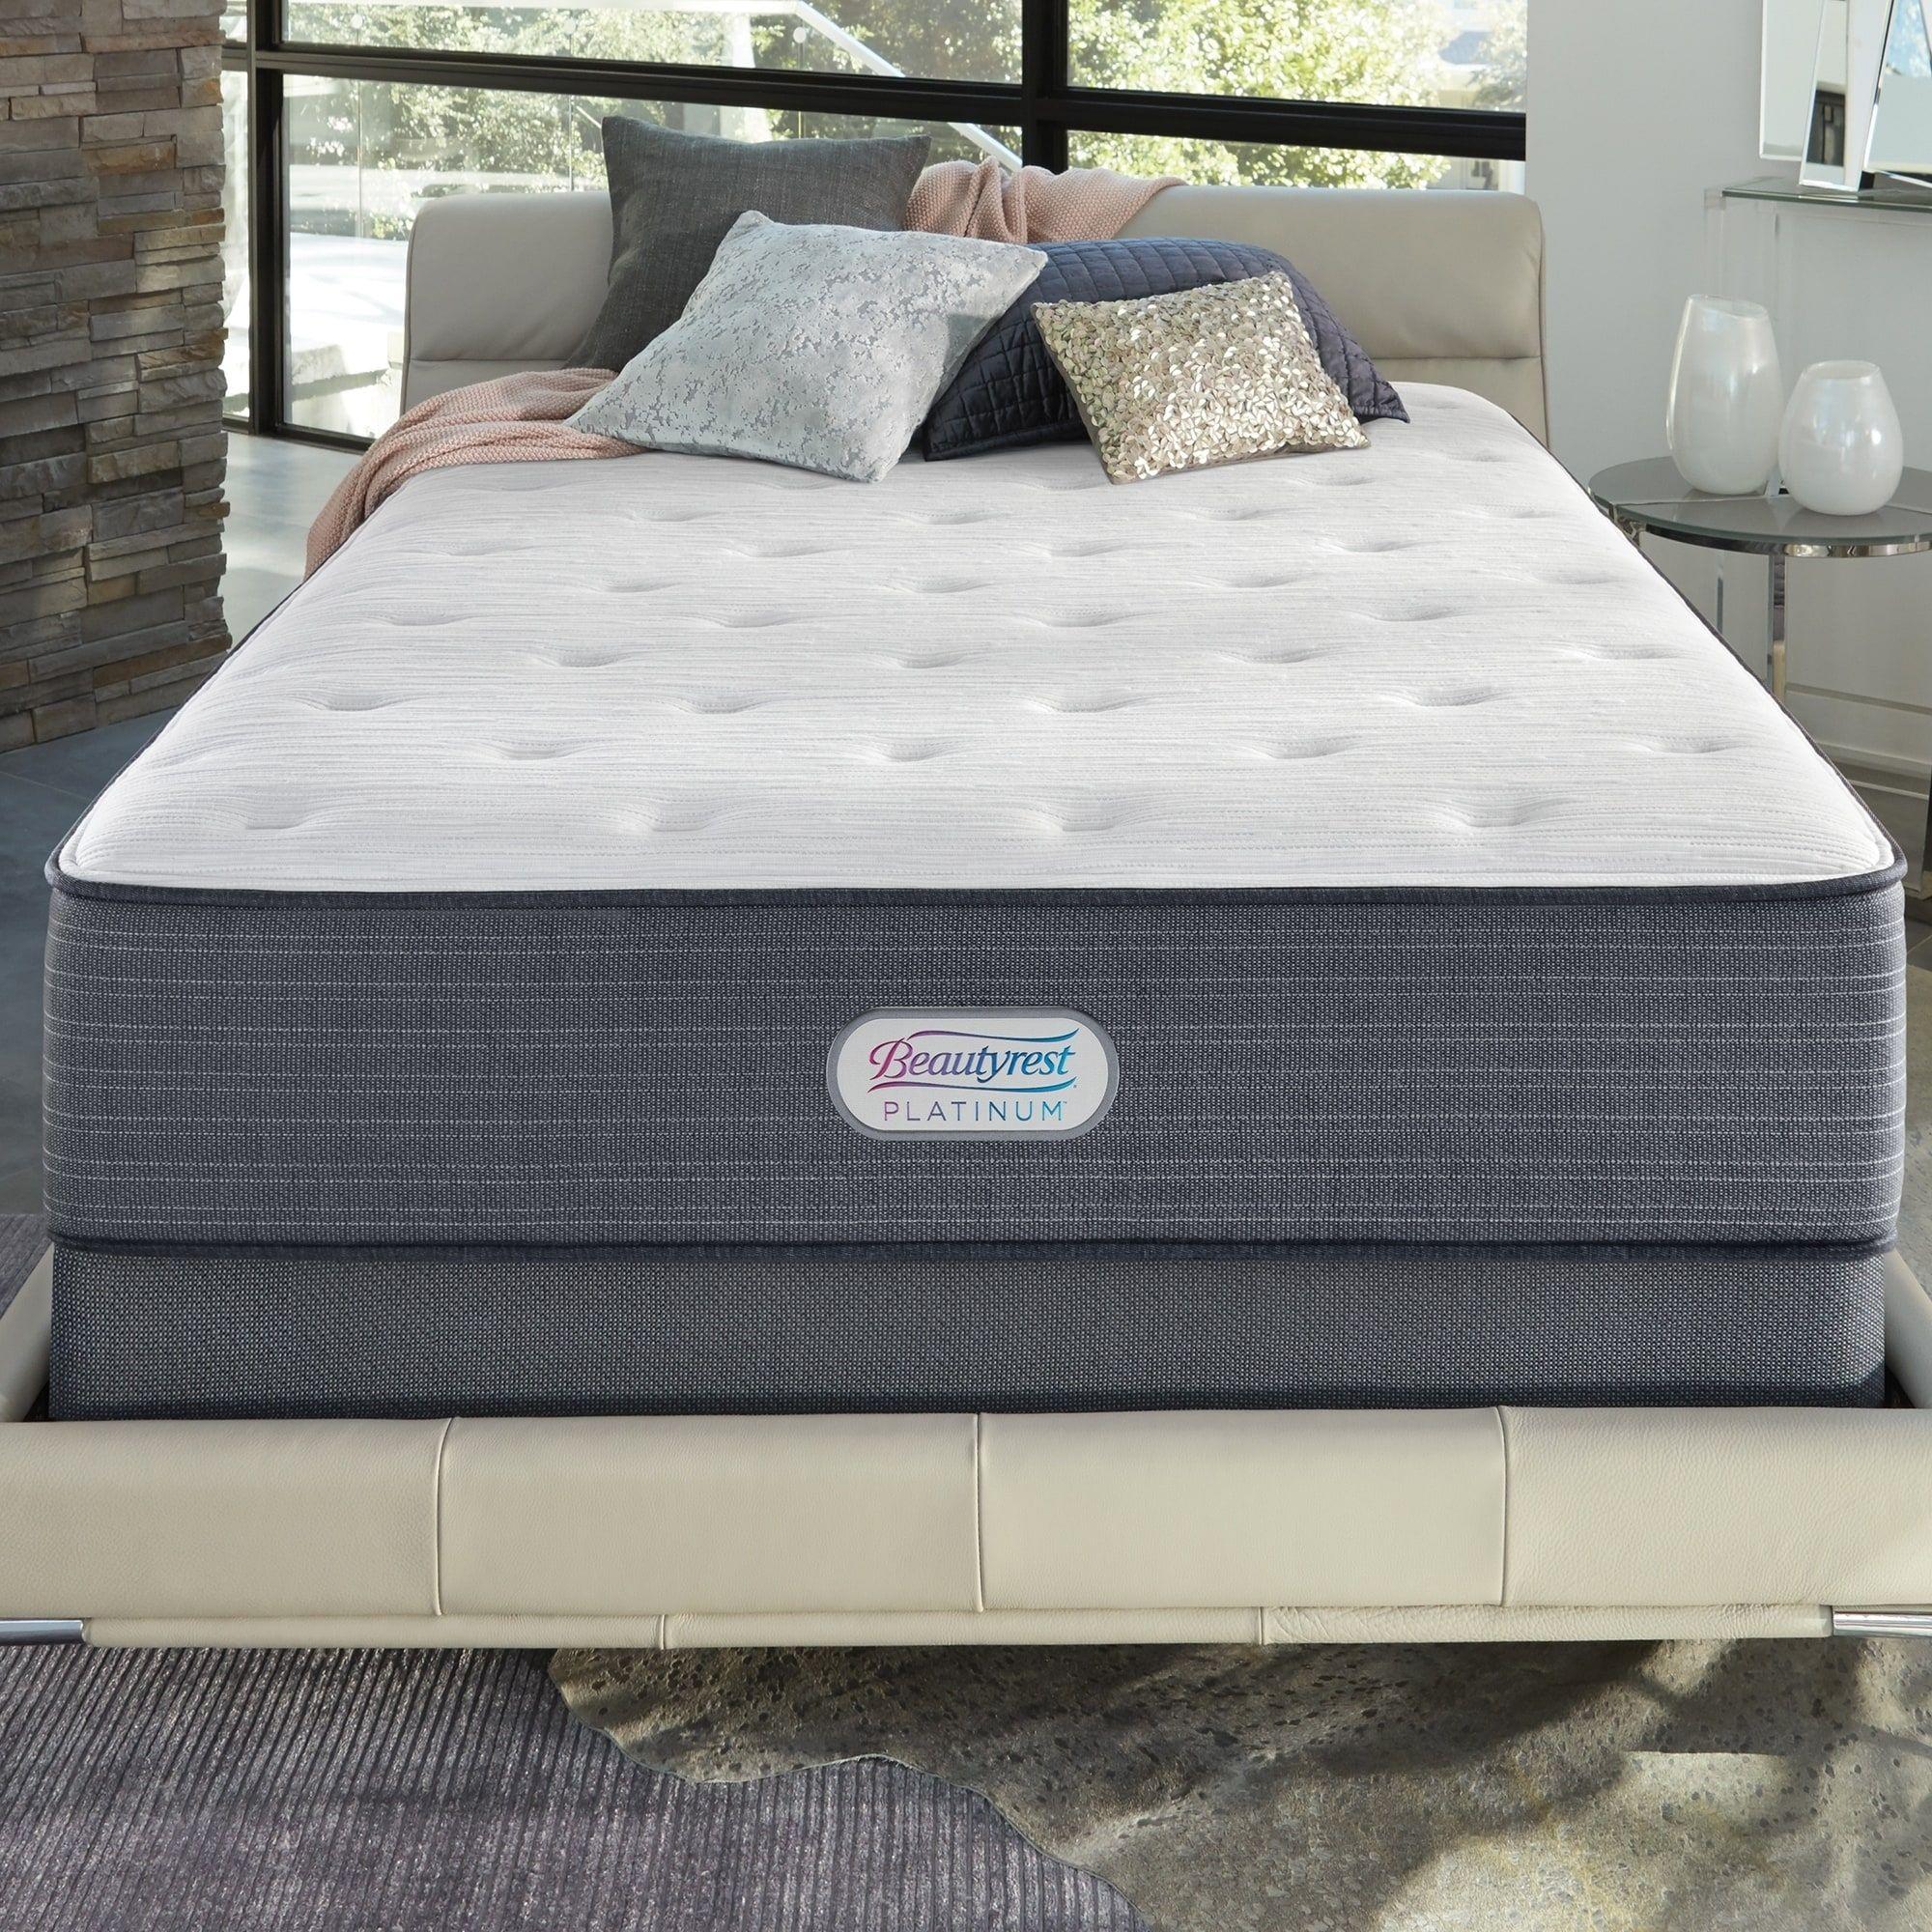 Beautyrest Platinum Spring Grove 14 Inch Luxury Firm Mattress Set